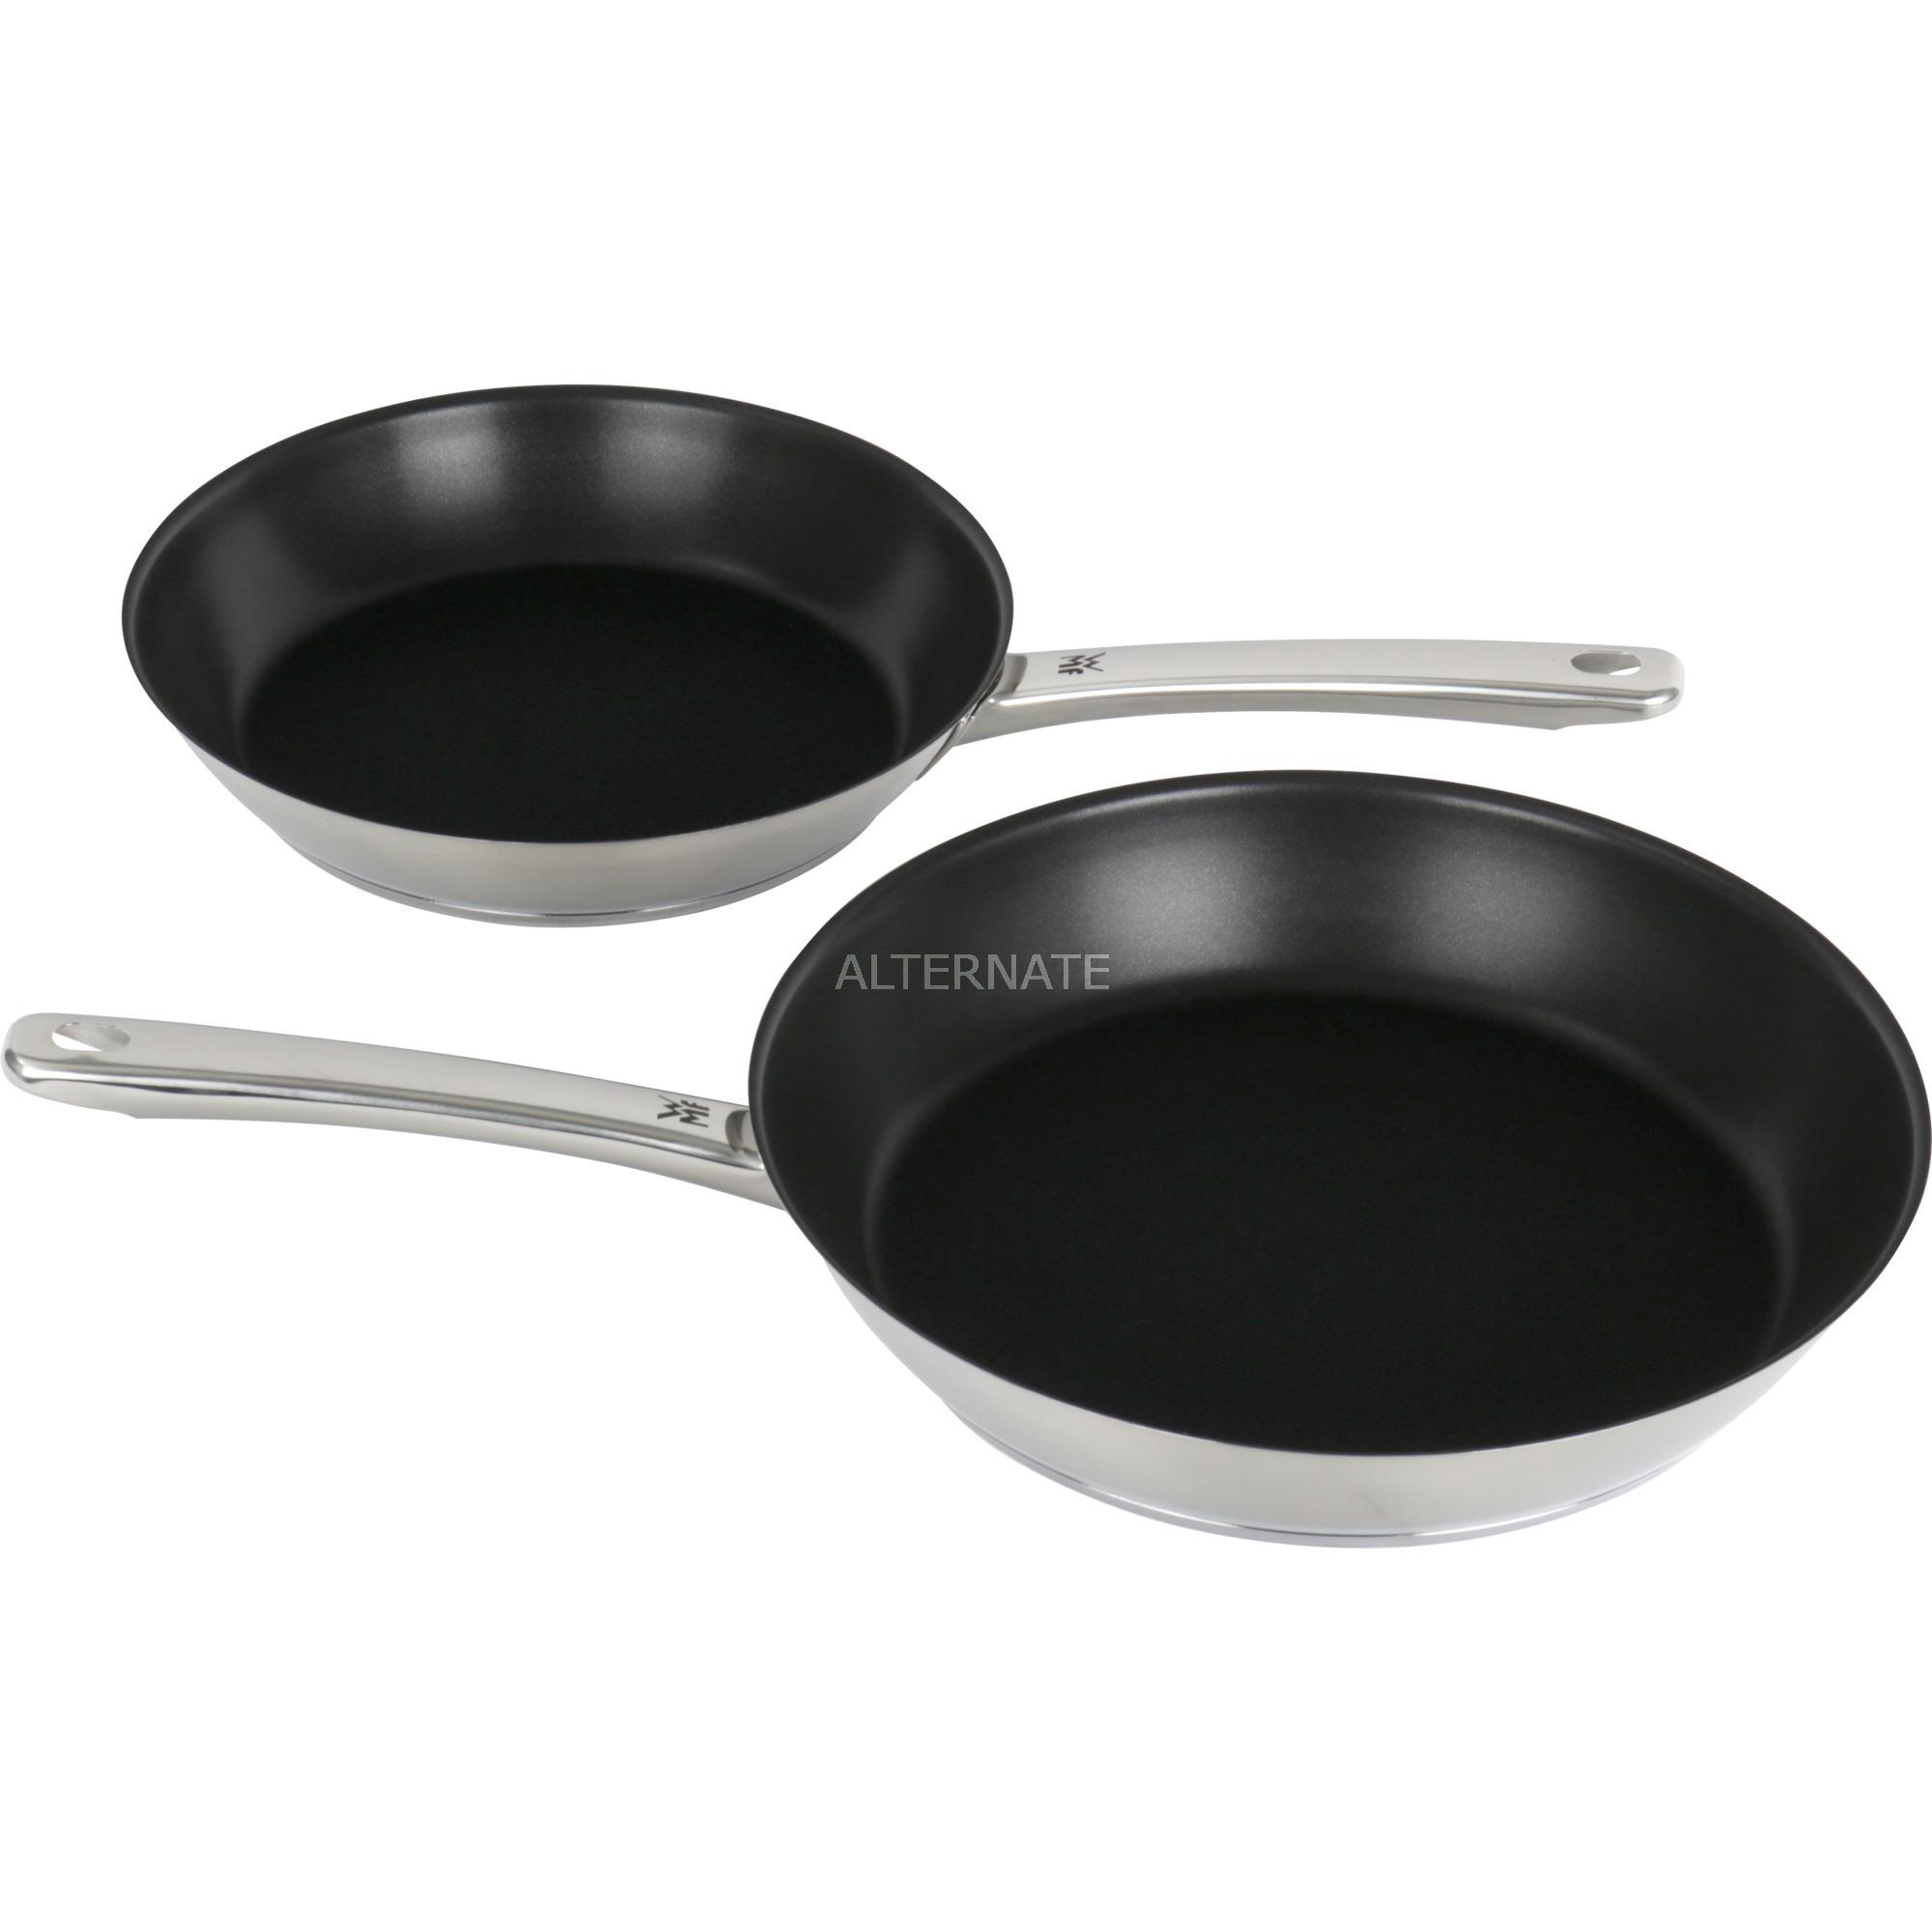 23021, Pan